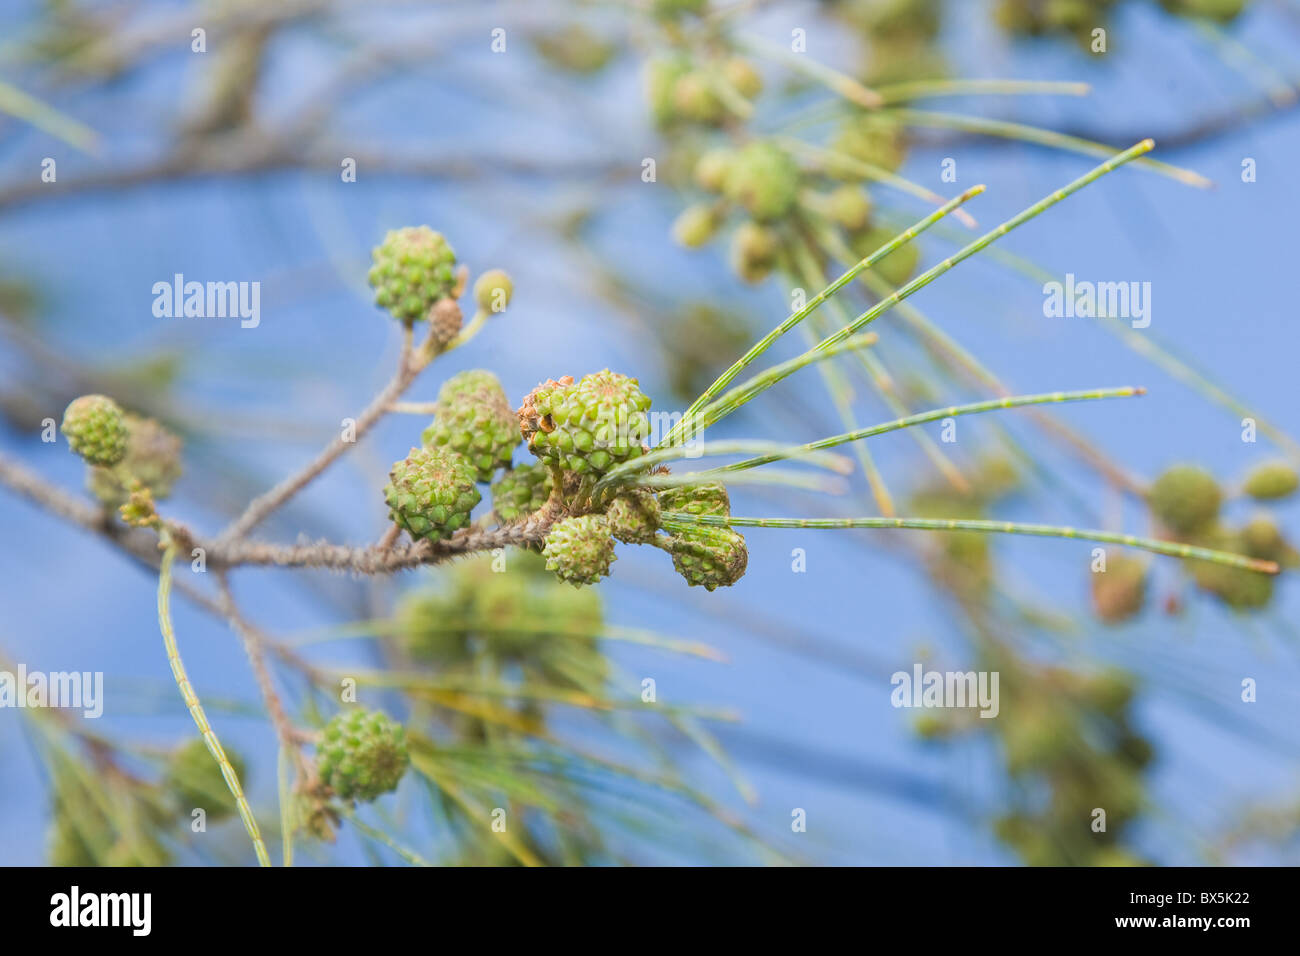 Casuarina Equisetifolia or the Australian pine - Stock Image